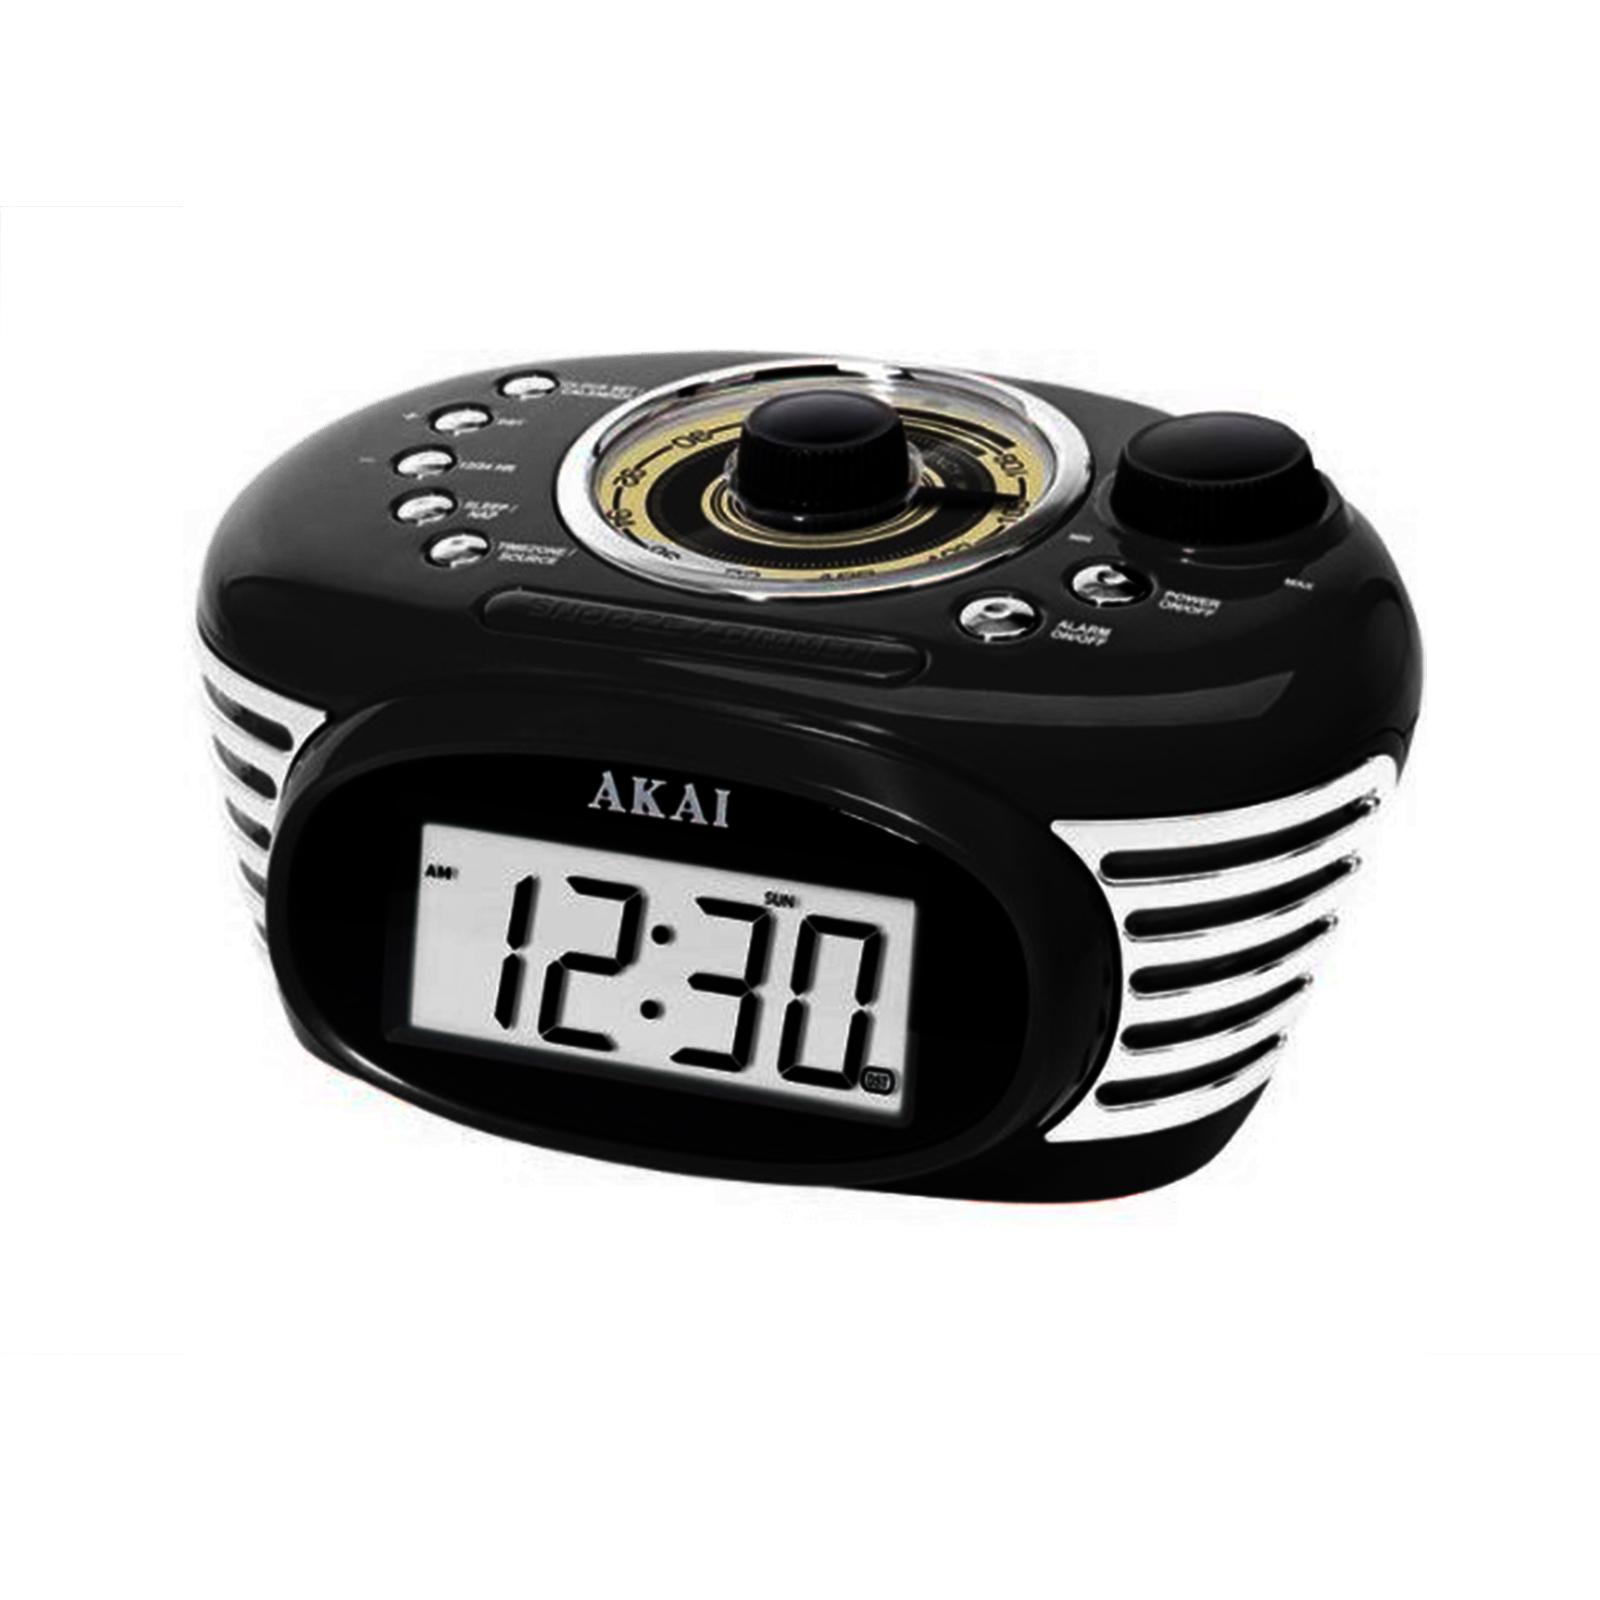 akai retro radio alarm digital backlight lcd display clock. Black Bedroom Furniture Sets. Home Design Ideas